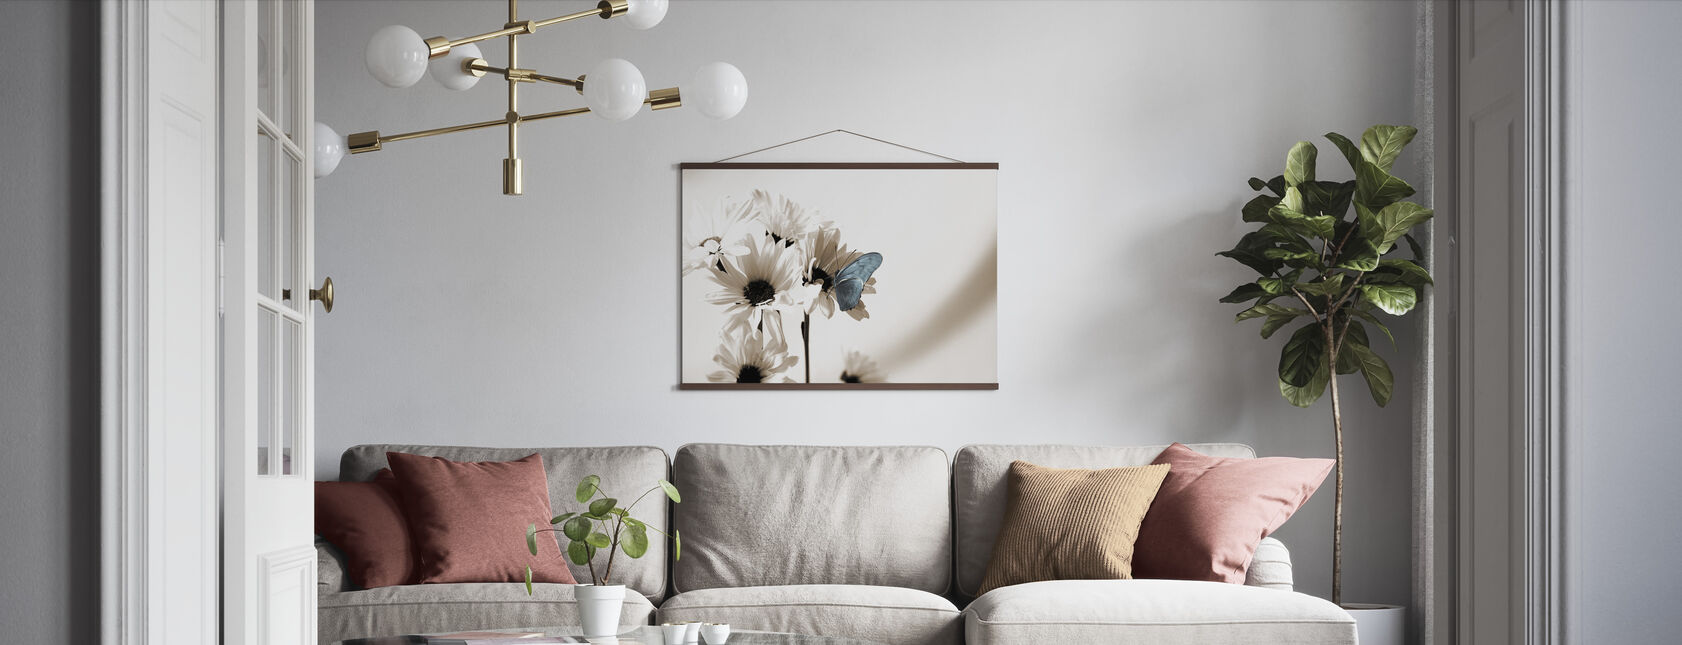 Julia Butterfly - Blauw - Poster - Woonkamer